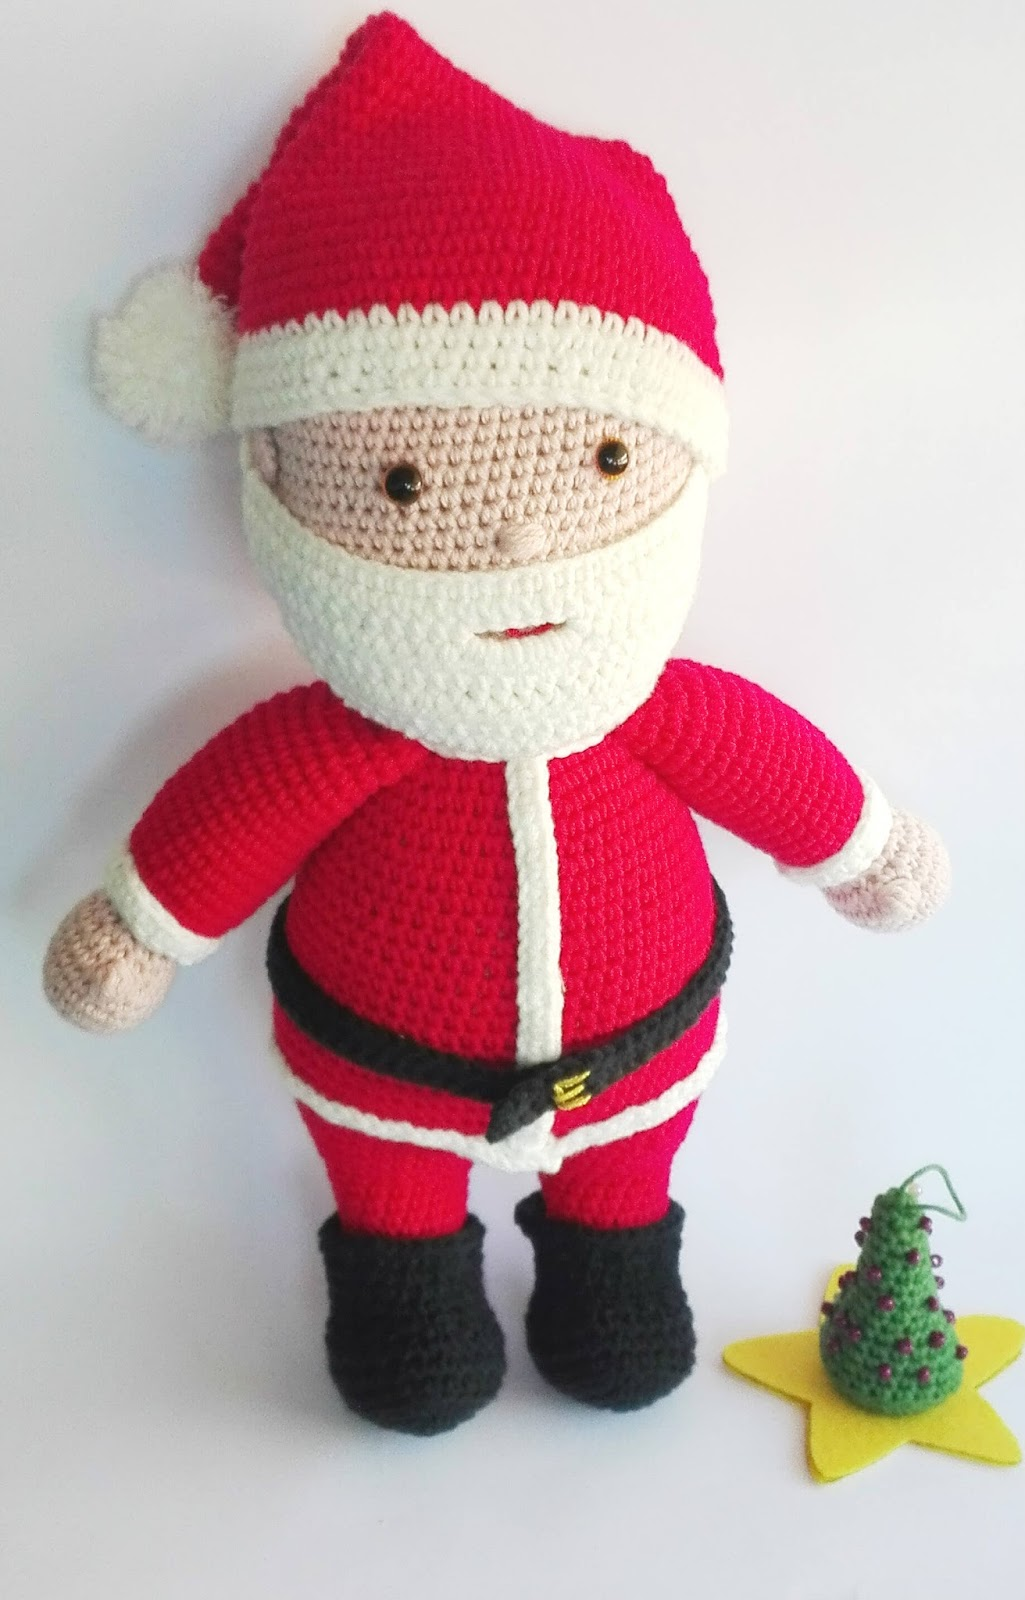 en]Santa Claus Was Updated[:tr]Noel Baba Güncellendi ... | 1600x1025